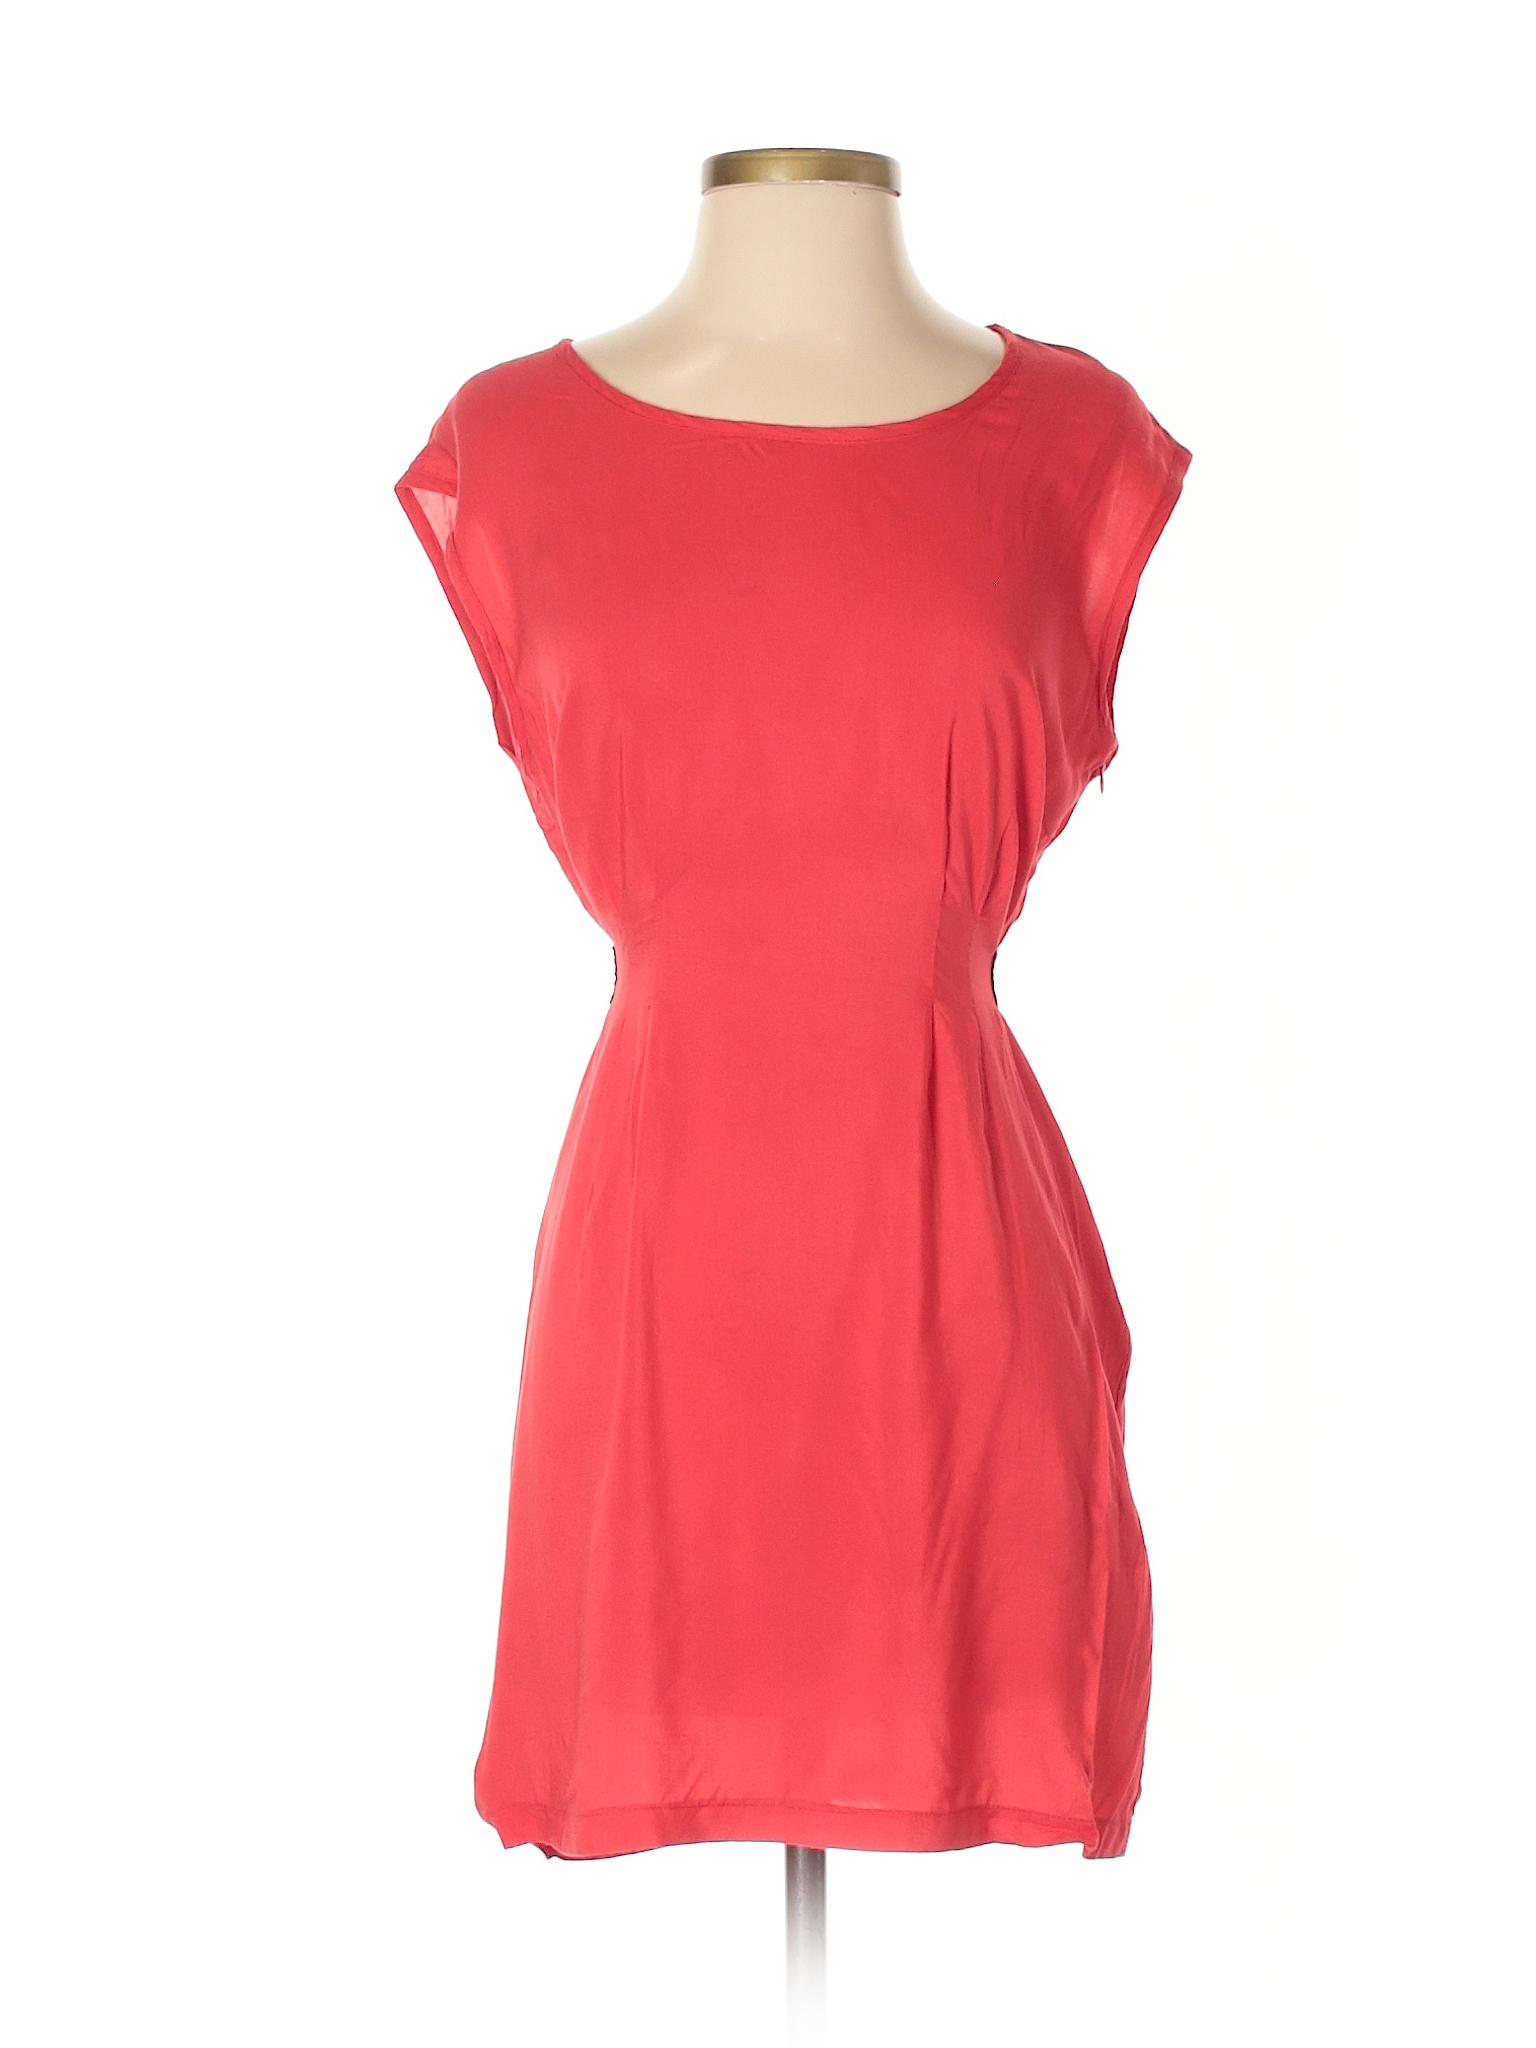 Dress Casual 1988 winter Piko Boutique 8CnUIwq77